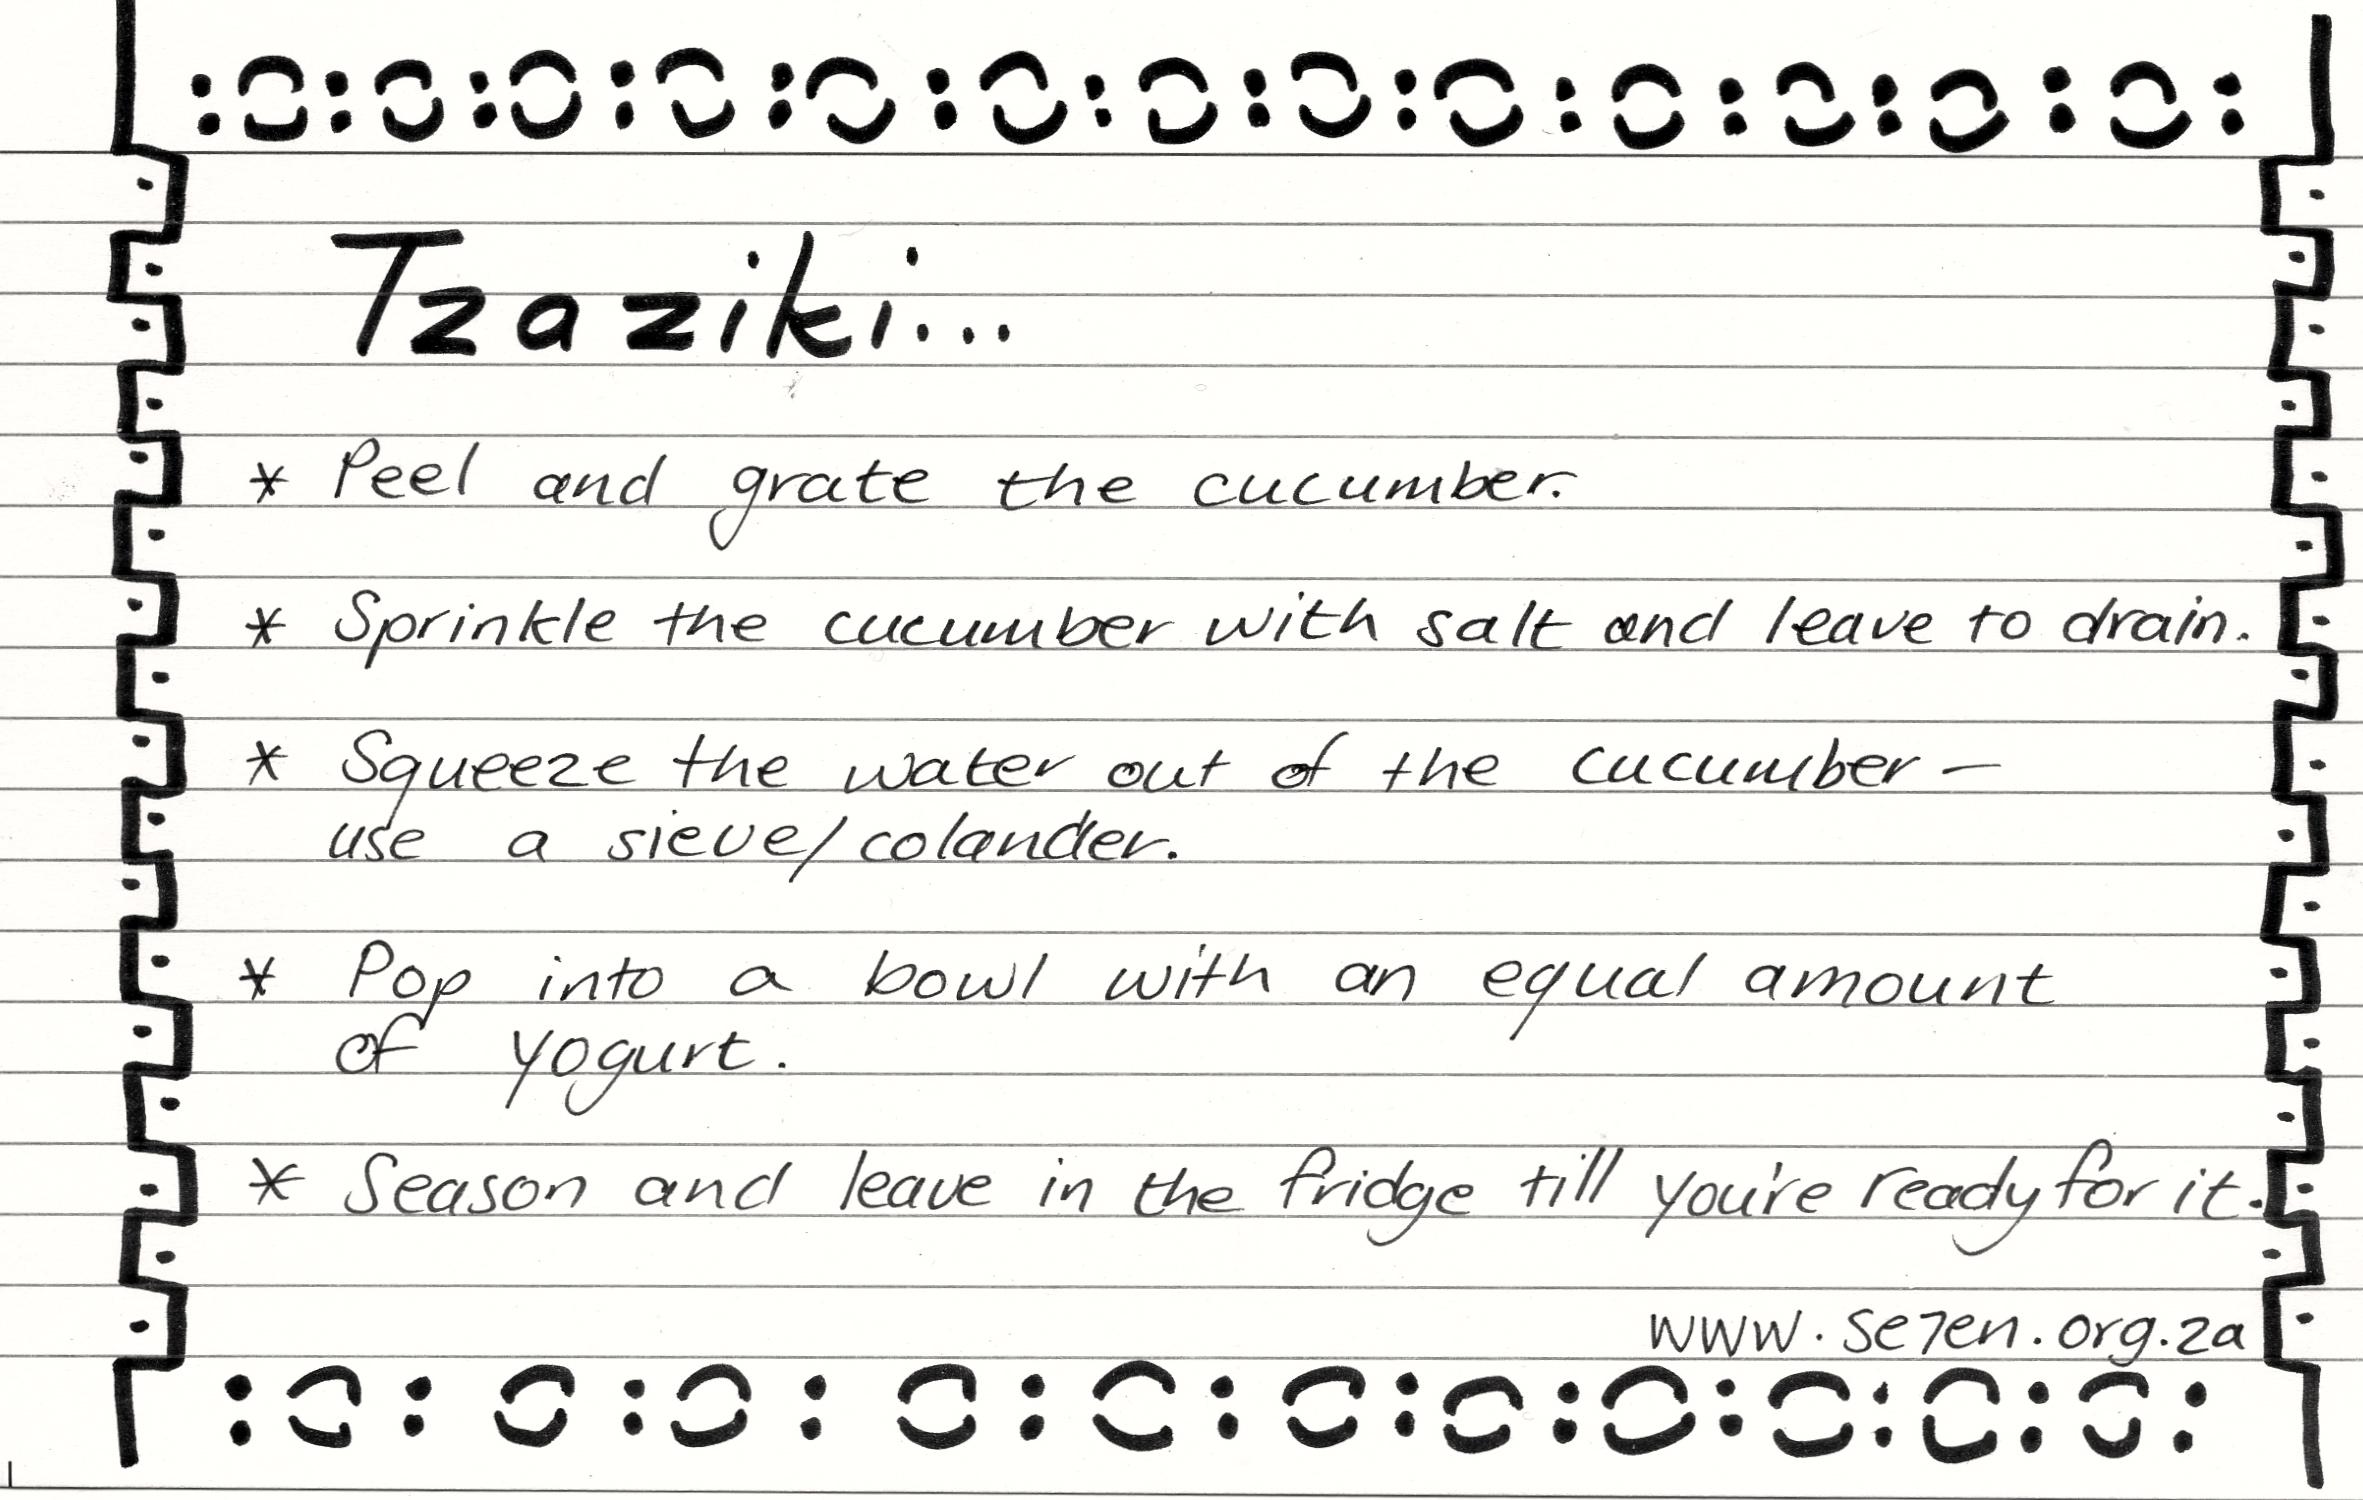 recipe card Tzaziki003